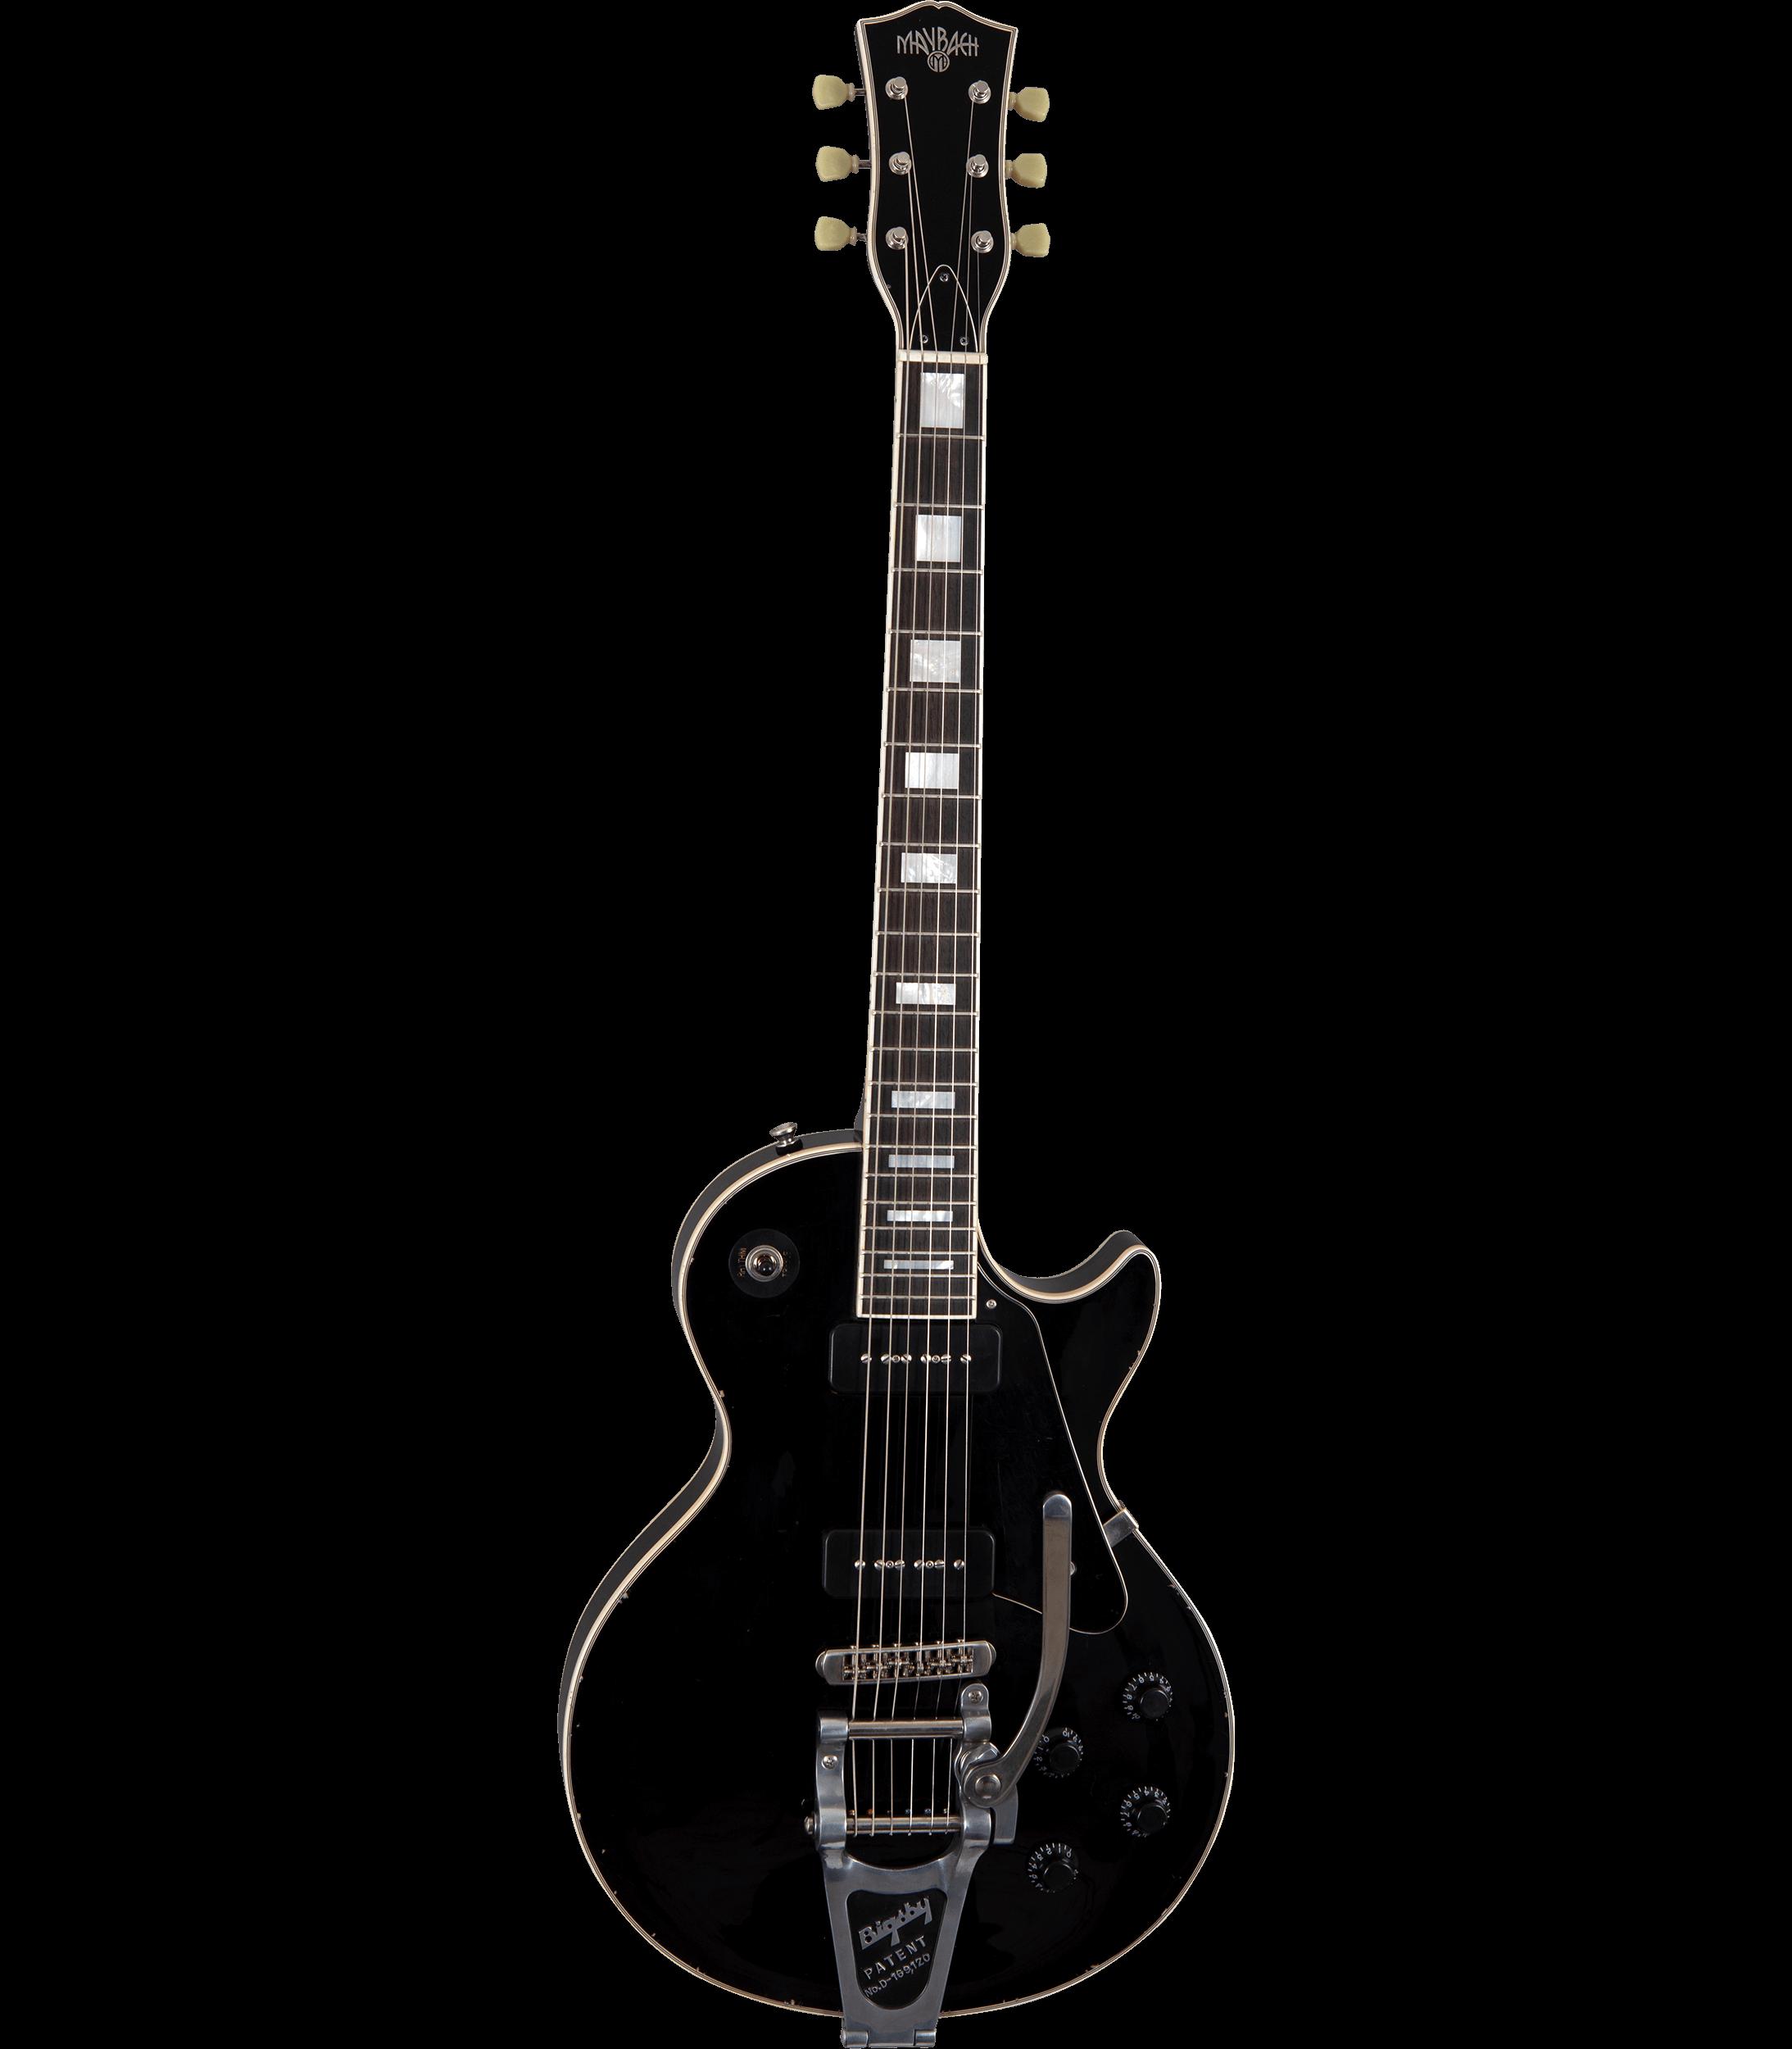 Maybach Lester Black Velvet Custom P90 Bigsby B7 60s Slim Taper Hero-Shot